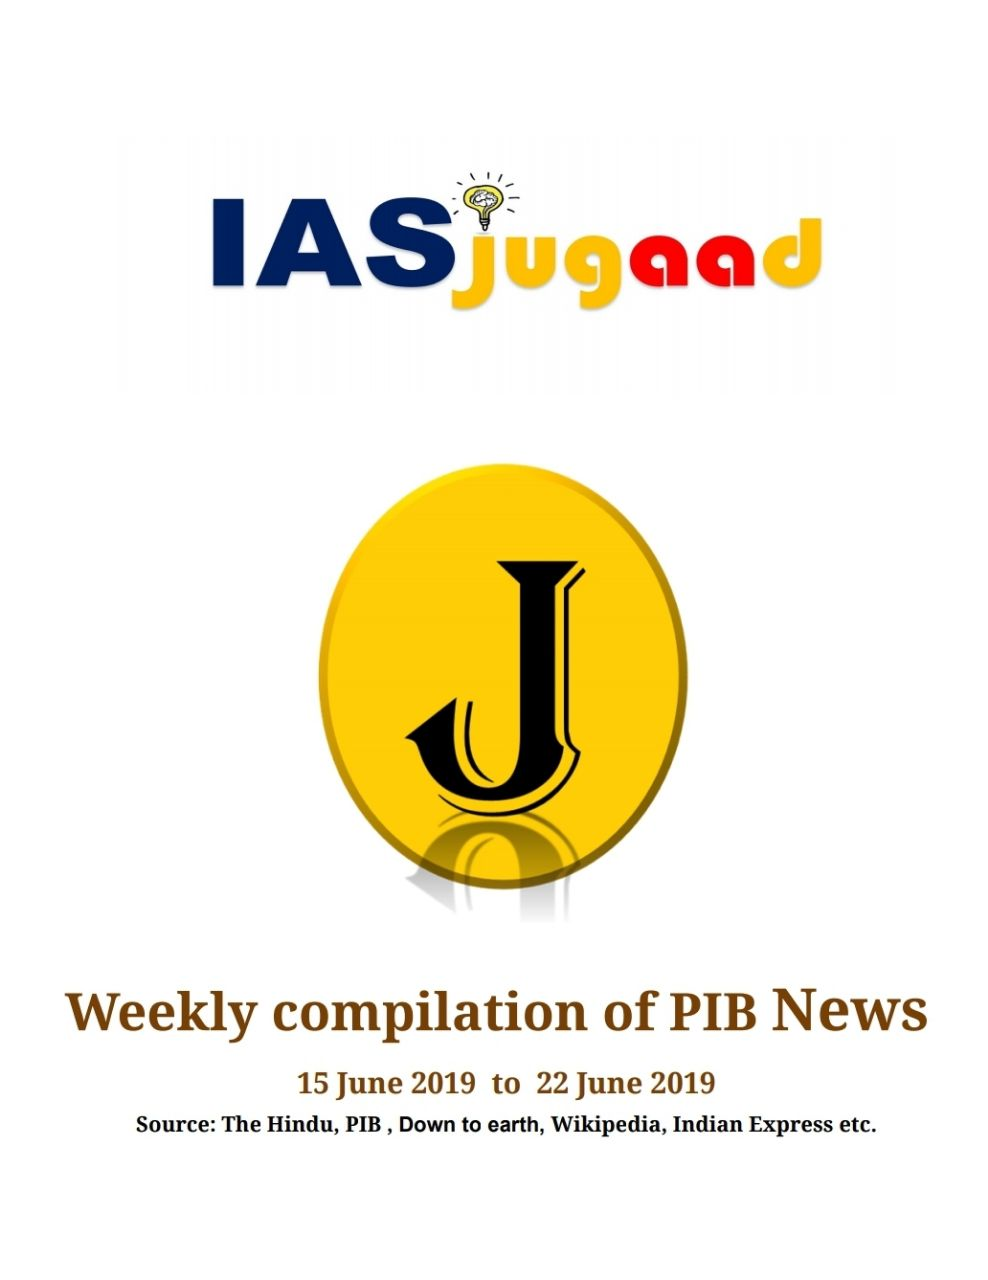 IASjugaad Weekly Current Affairs PDF Download - JUNE 2019